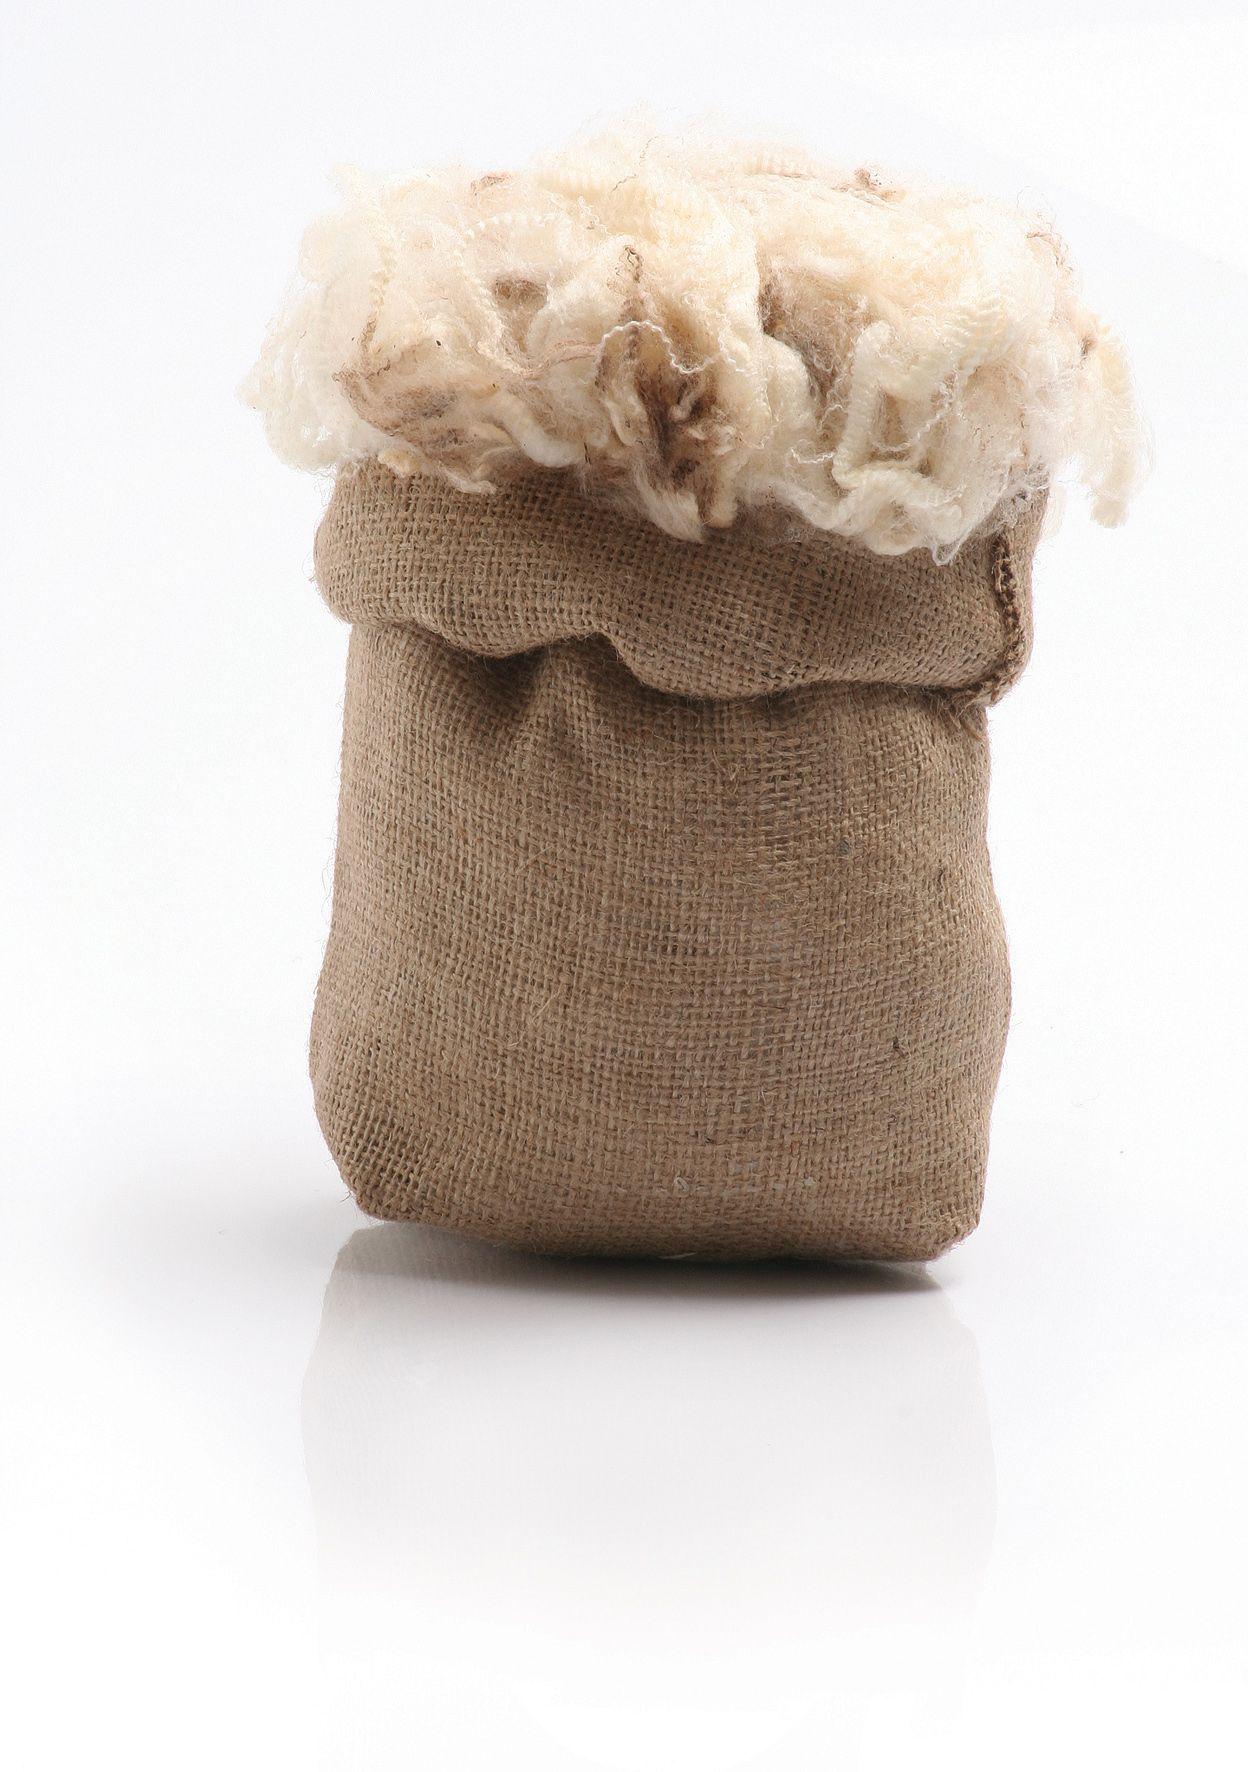 Wool Bale Bags, Prints, Design